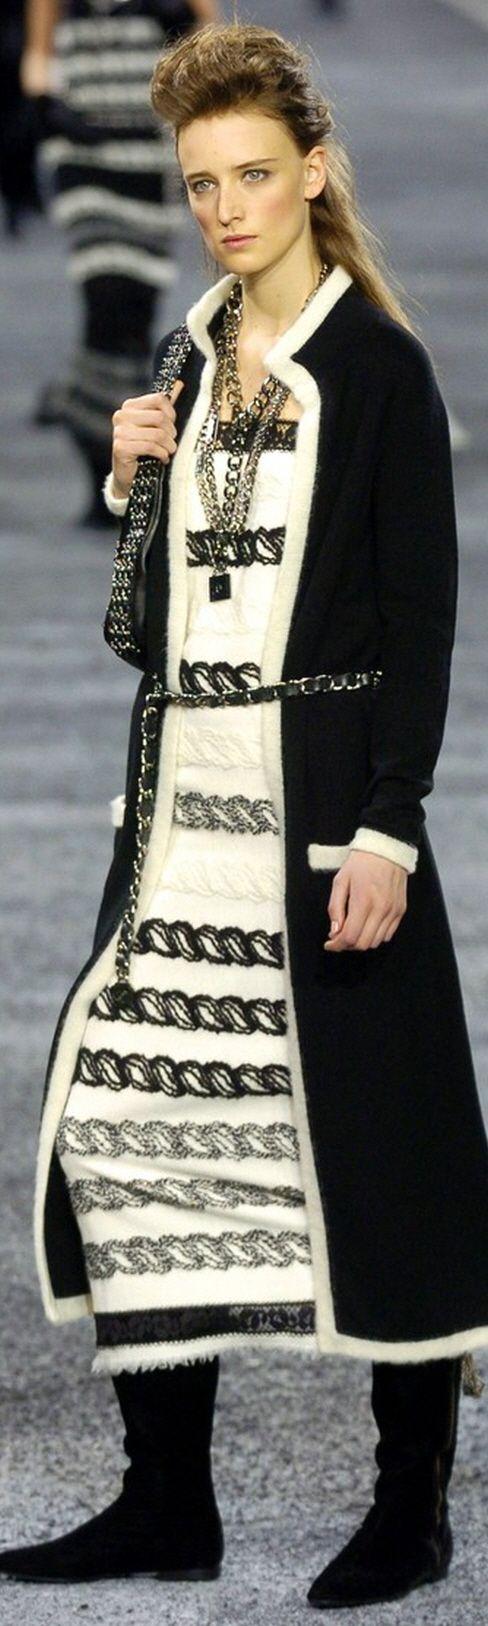 Chanel, Autumn/Winter 2004, Ready to Wear